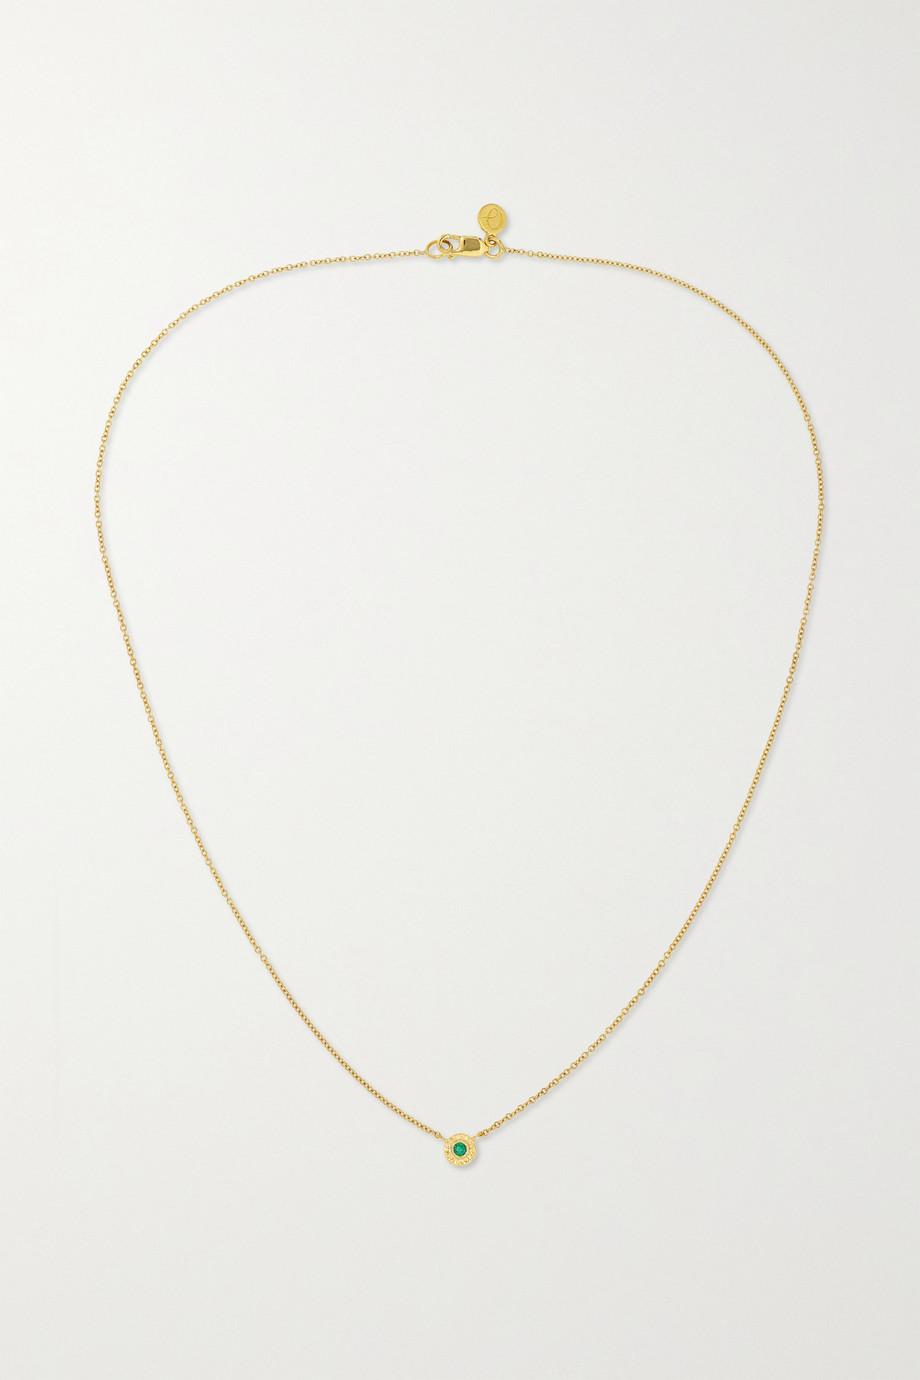 Octavia Elizabeth + NET SUSTAIN Nesting Gem Kette aus recyceltem 18 Karat Gold mit Smaragd